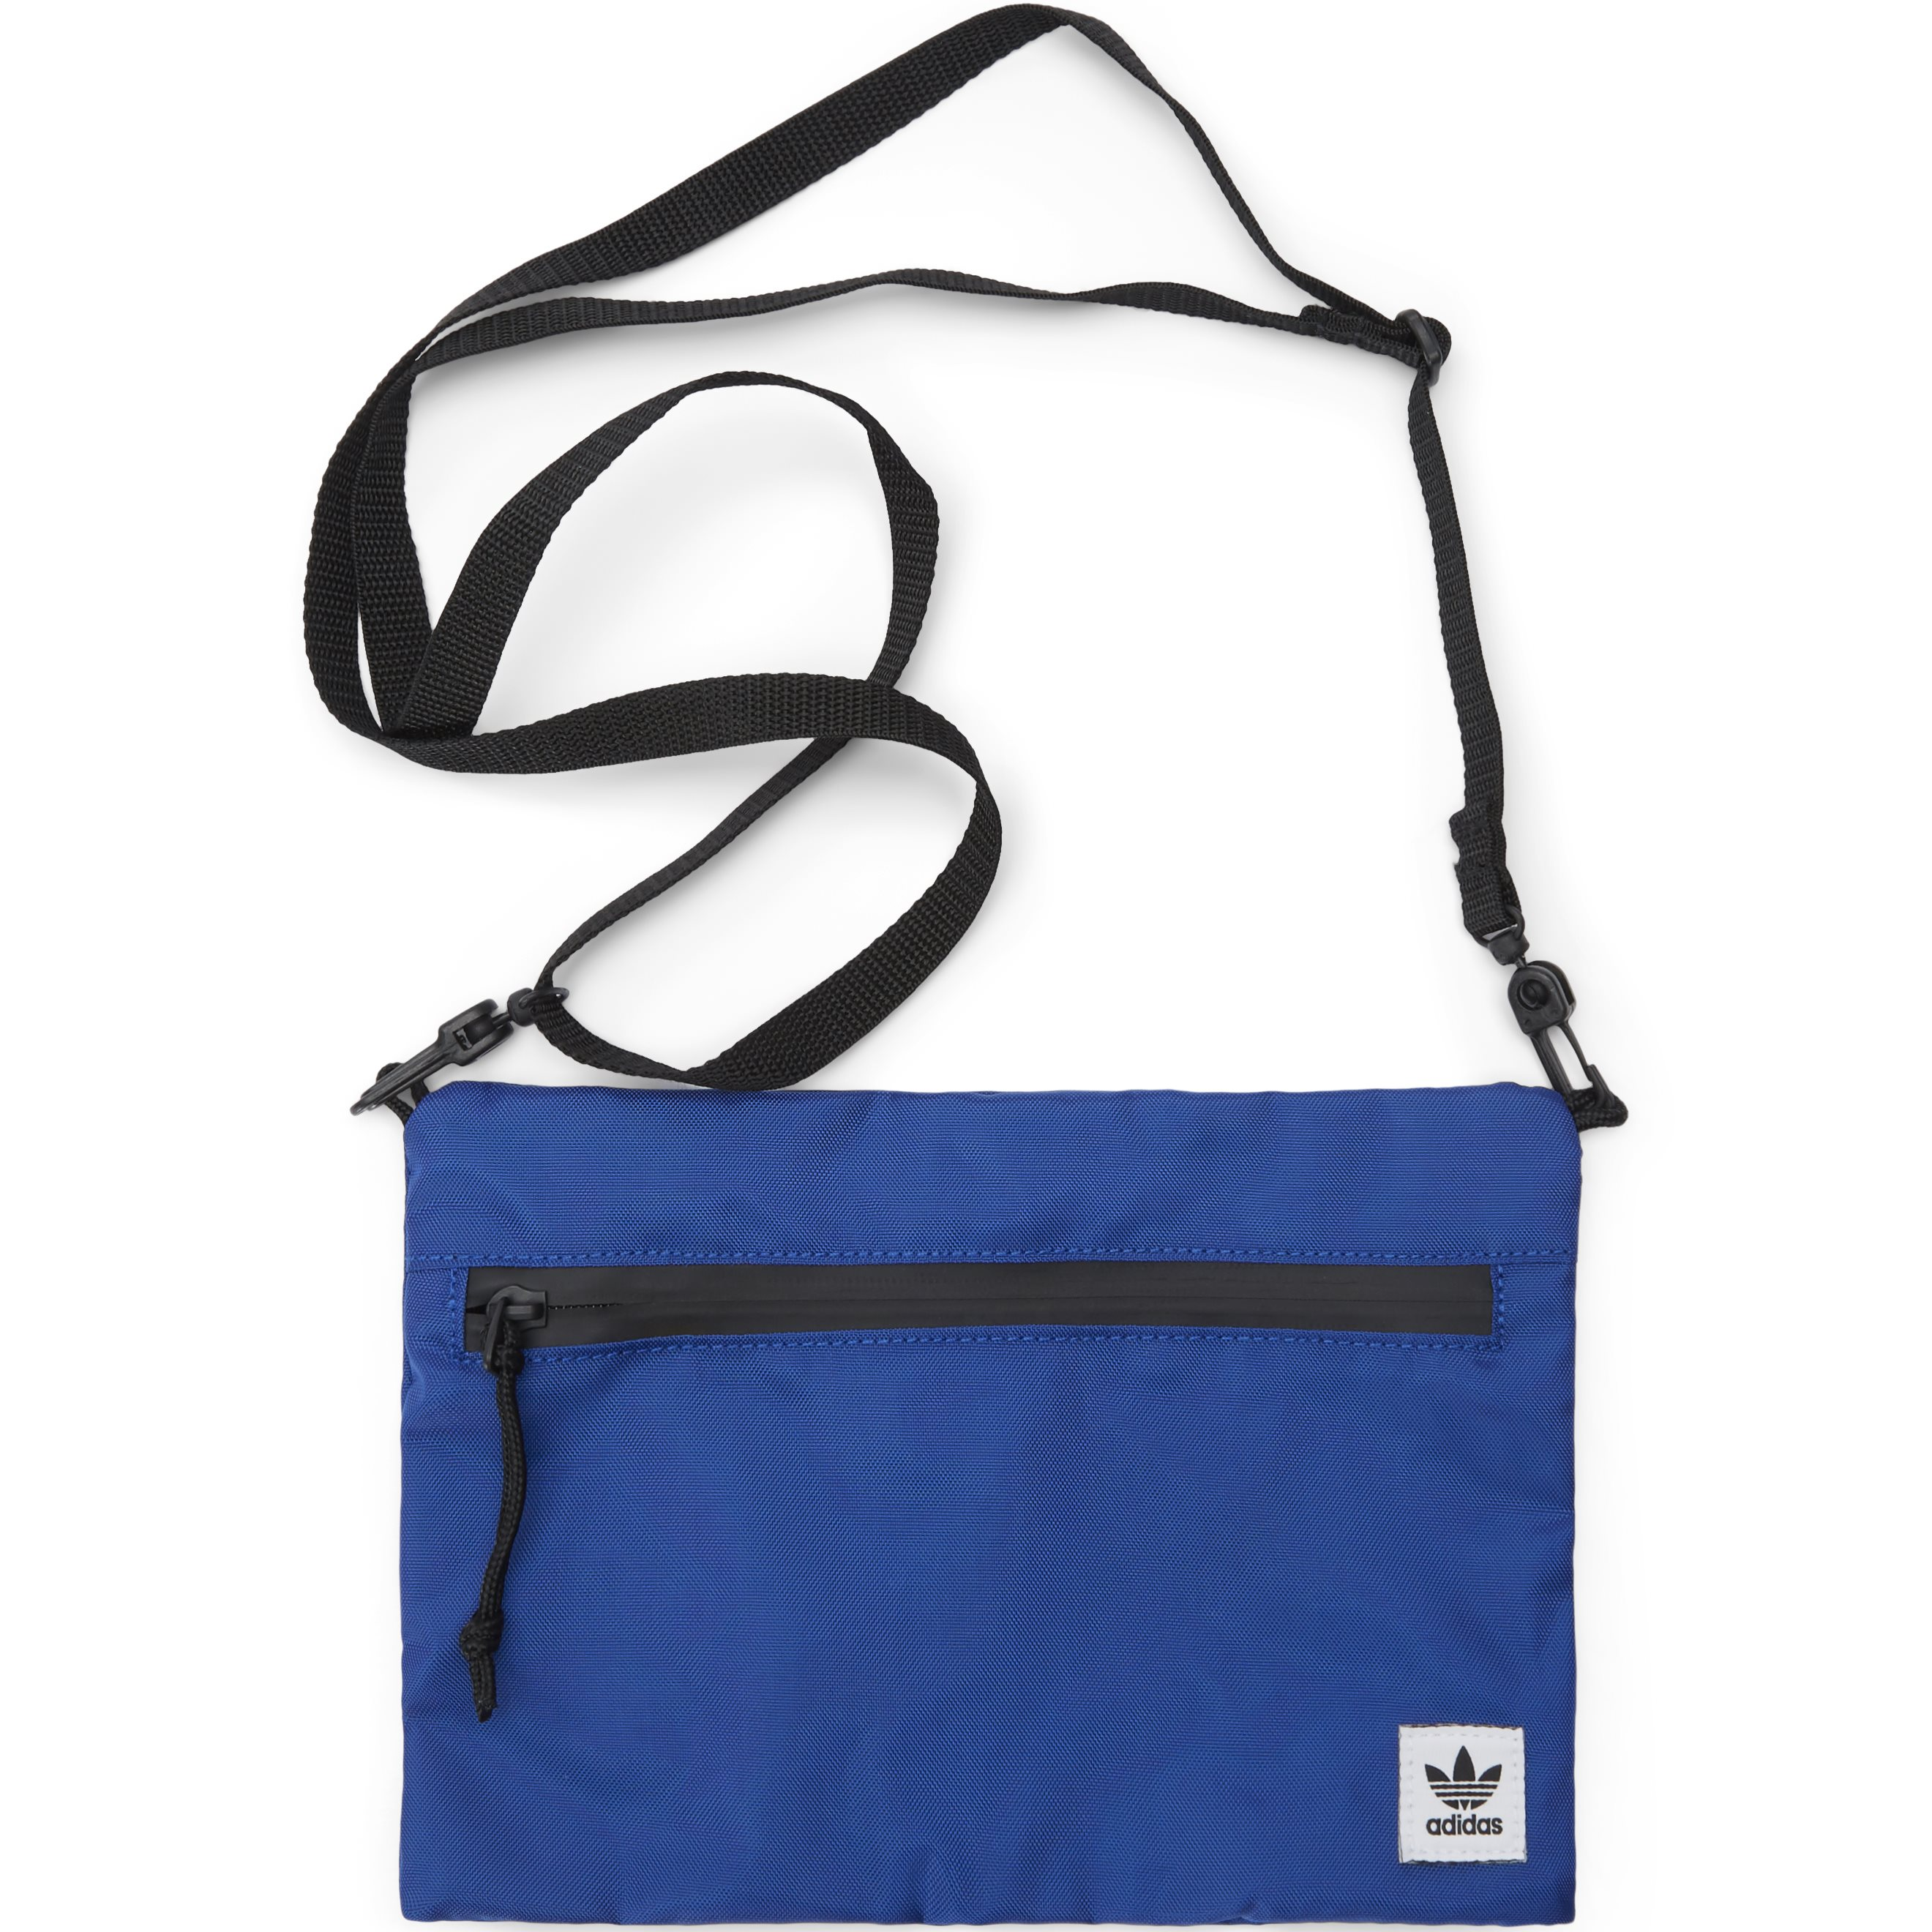 Simple Pouch Bag - Tasker - Blå